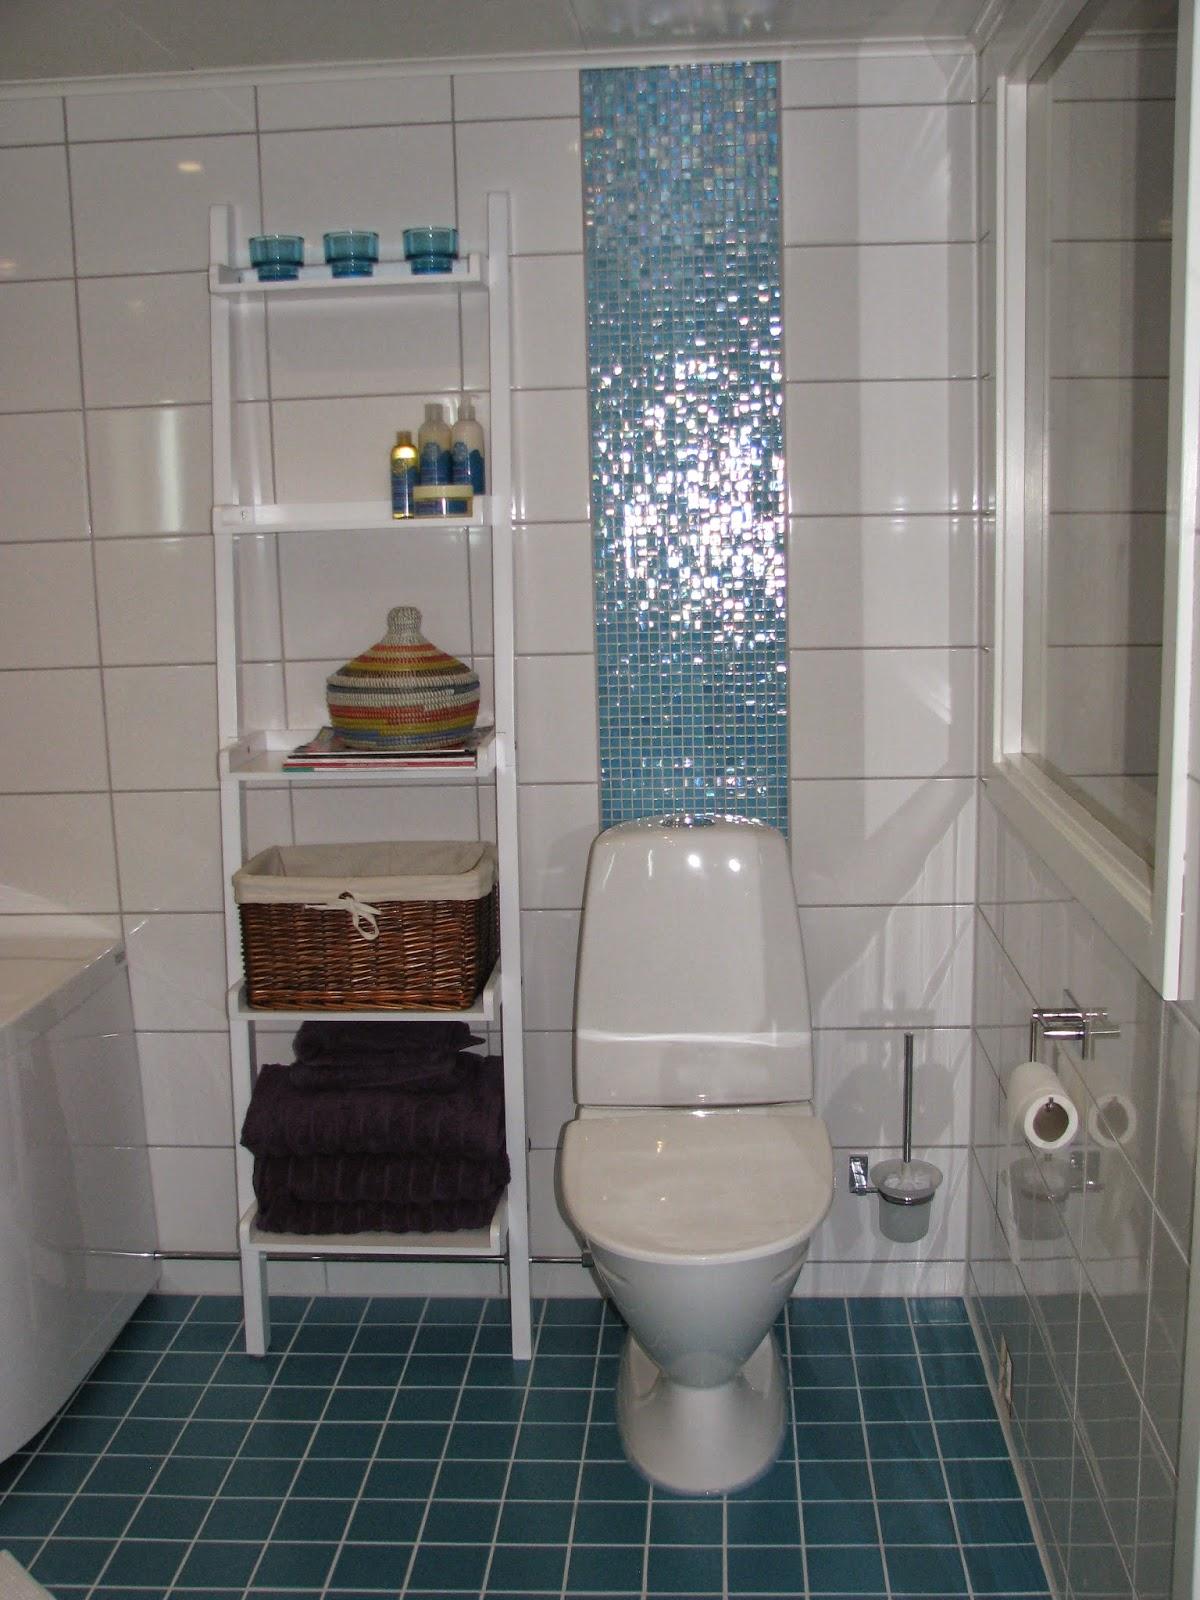 mosaik kok bauhaus interi rinspiration och id er f r. Black Bedroom Furniture Sets. Home Design Ideas